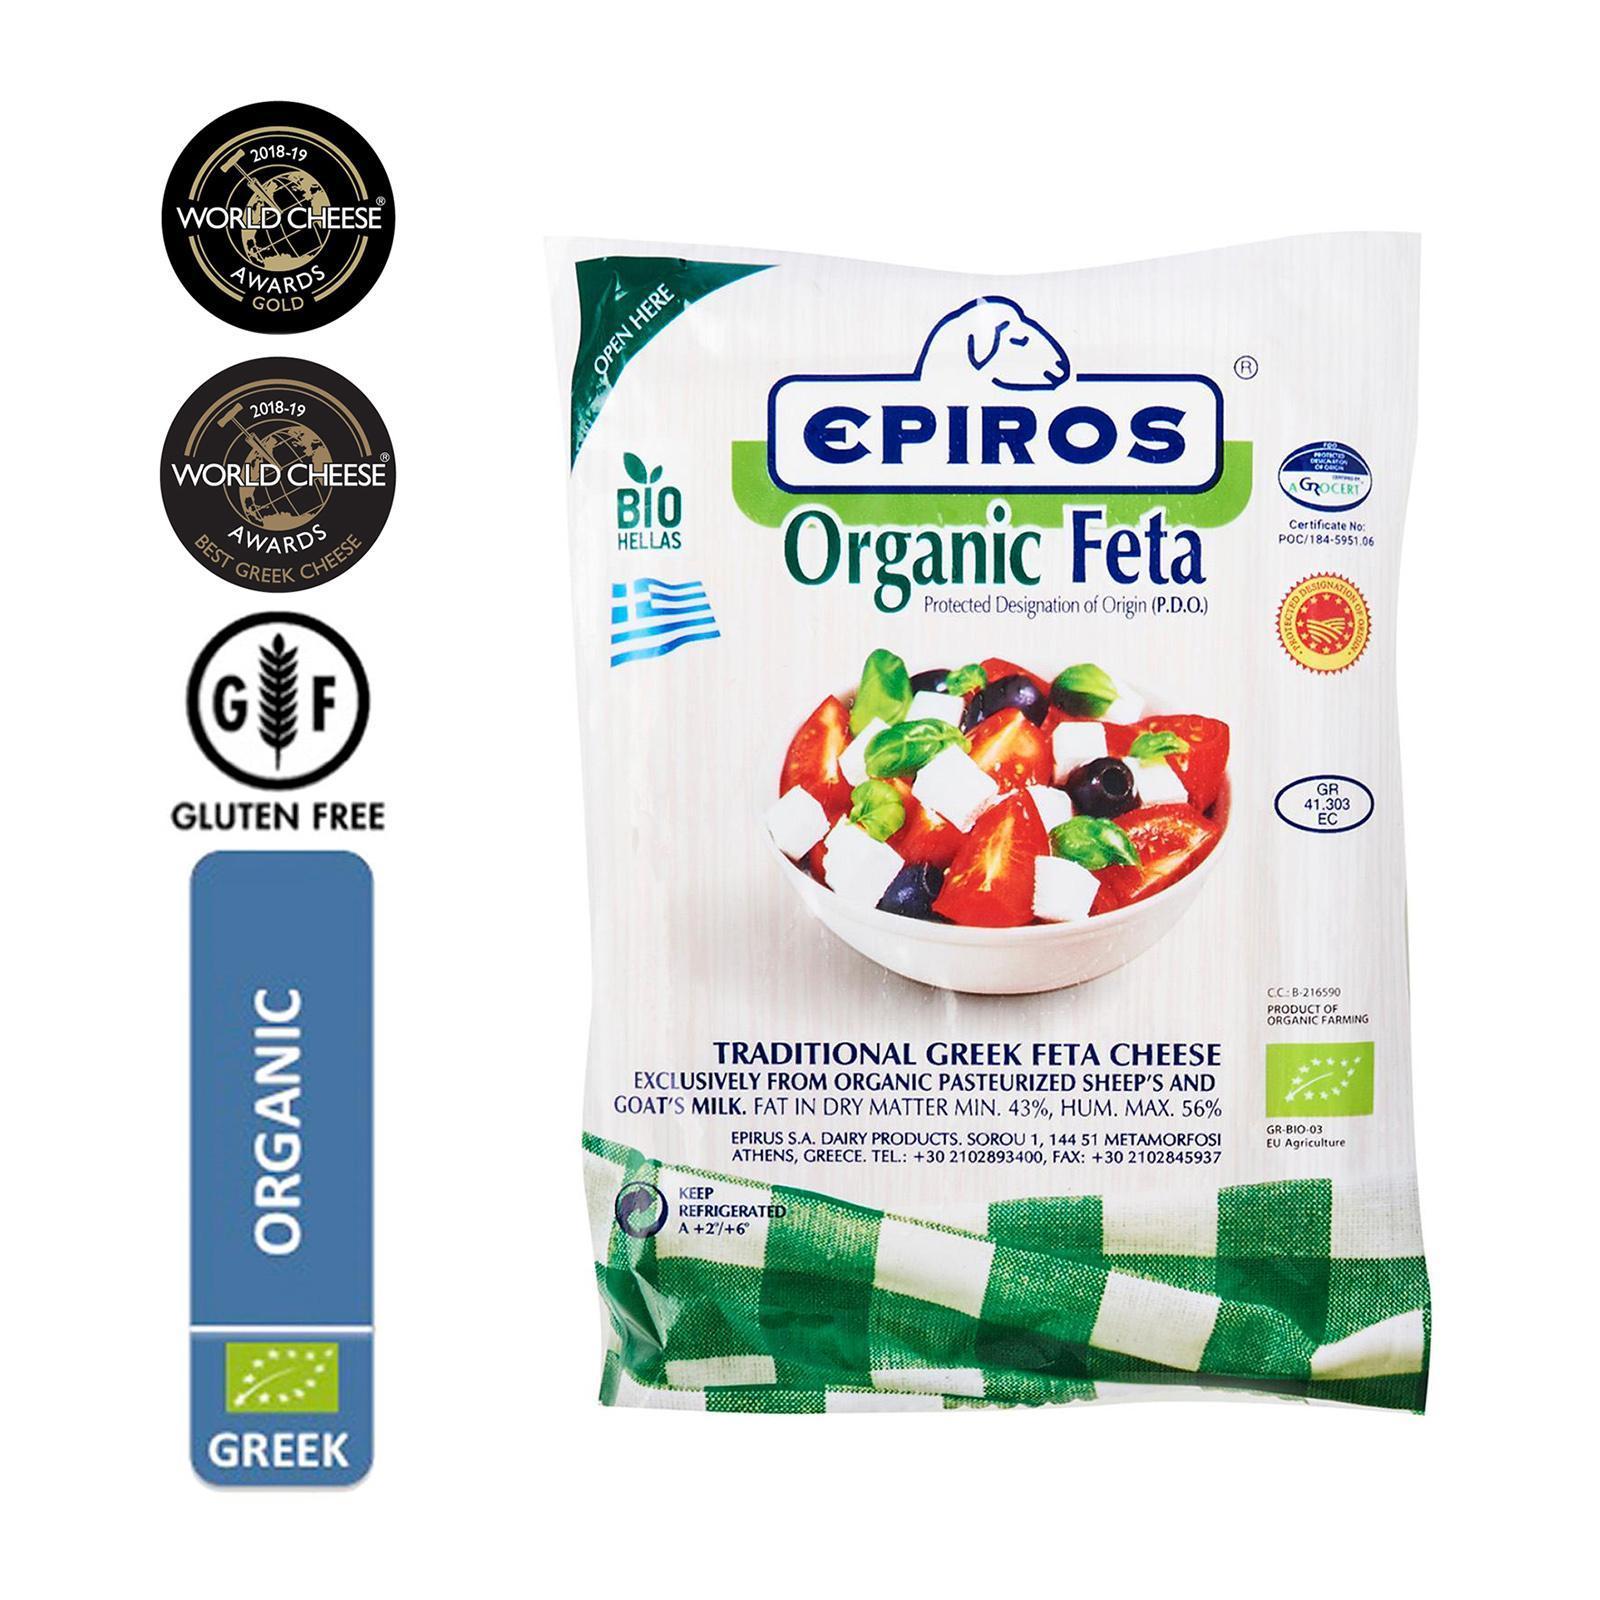 Epiros Organic Greek Feta Cheese (PDO) - By Agora Products